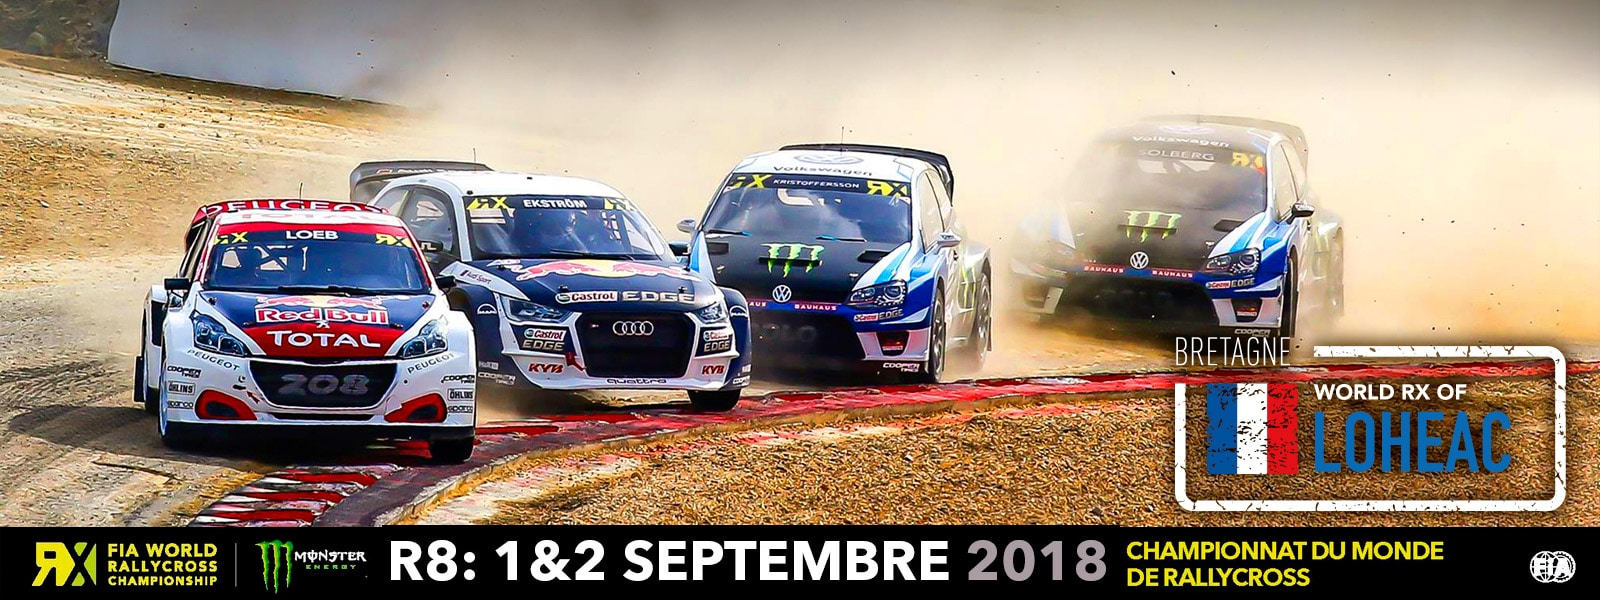 rx rallycross bretagne lohéac 2018